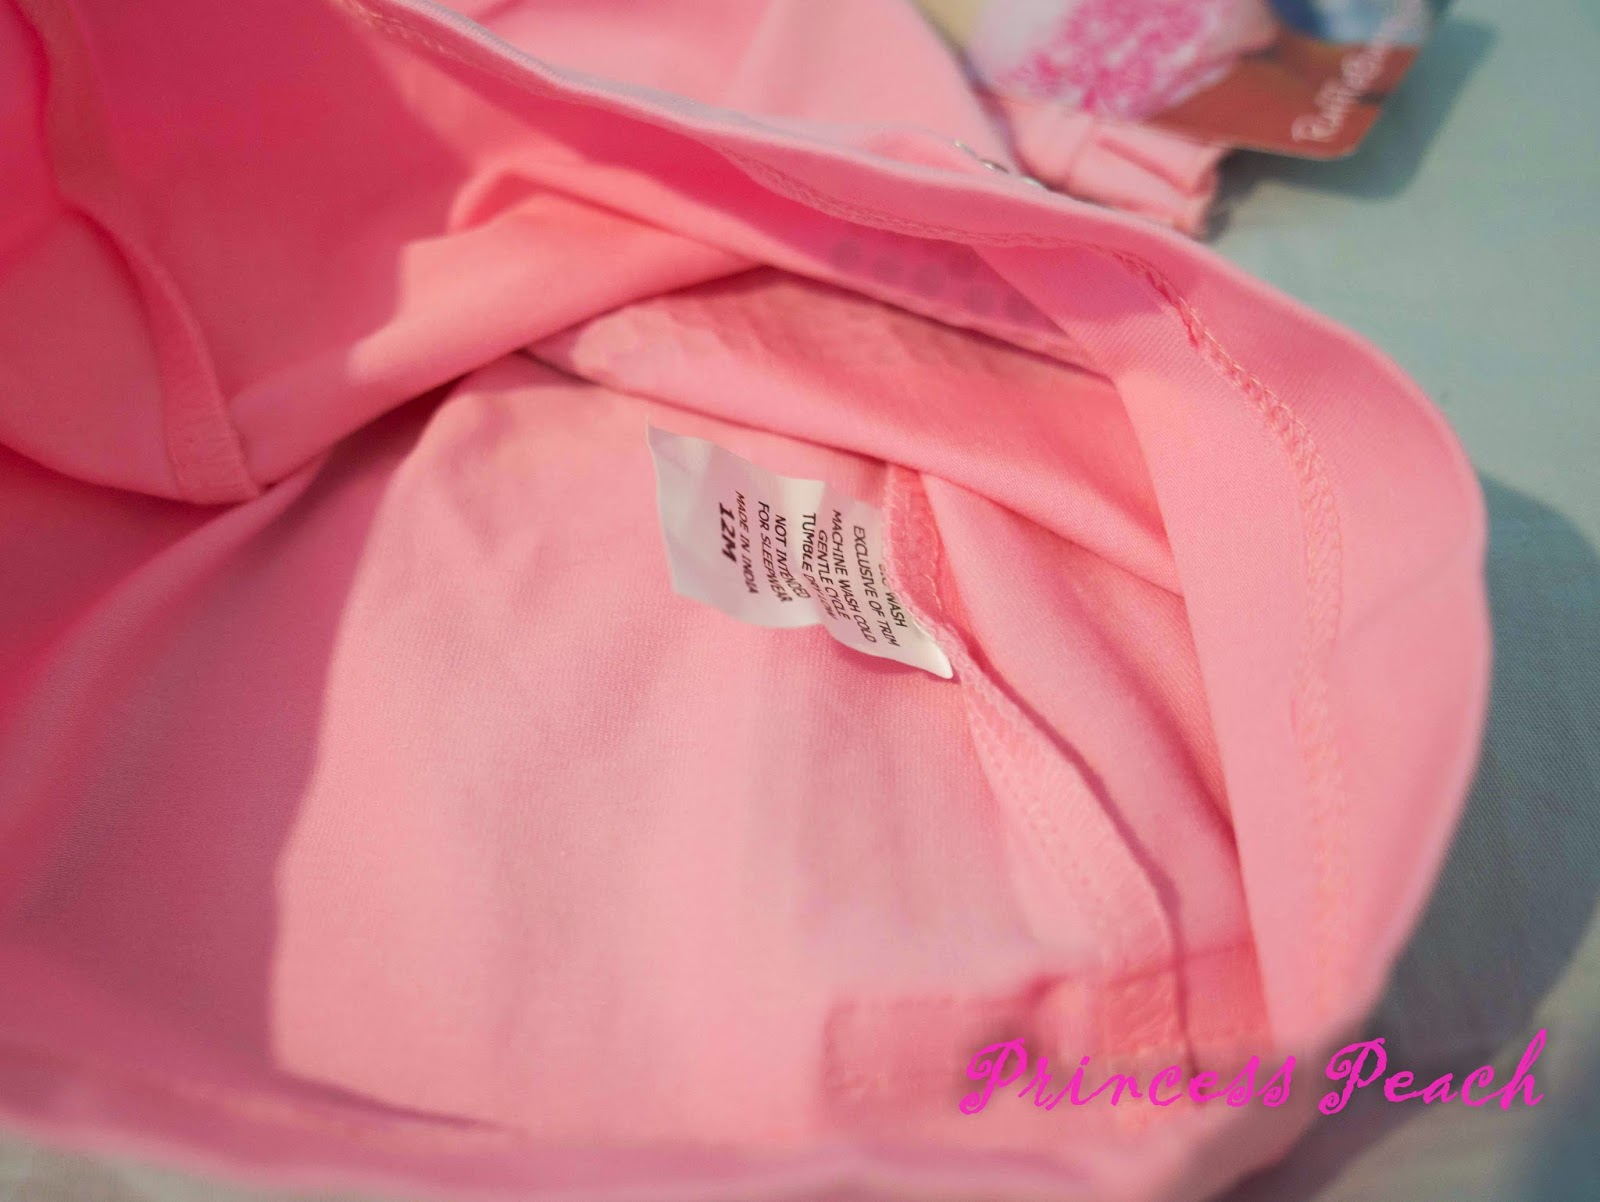 http://twpeach.blogspot.com/2015/04/us-clothes.html